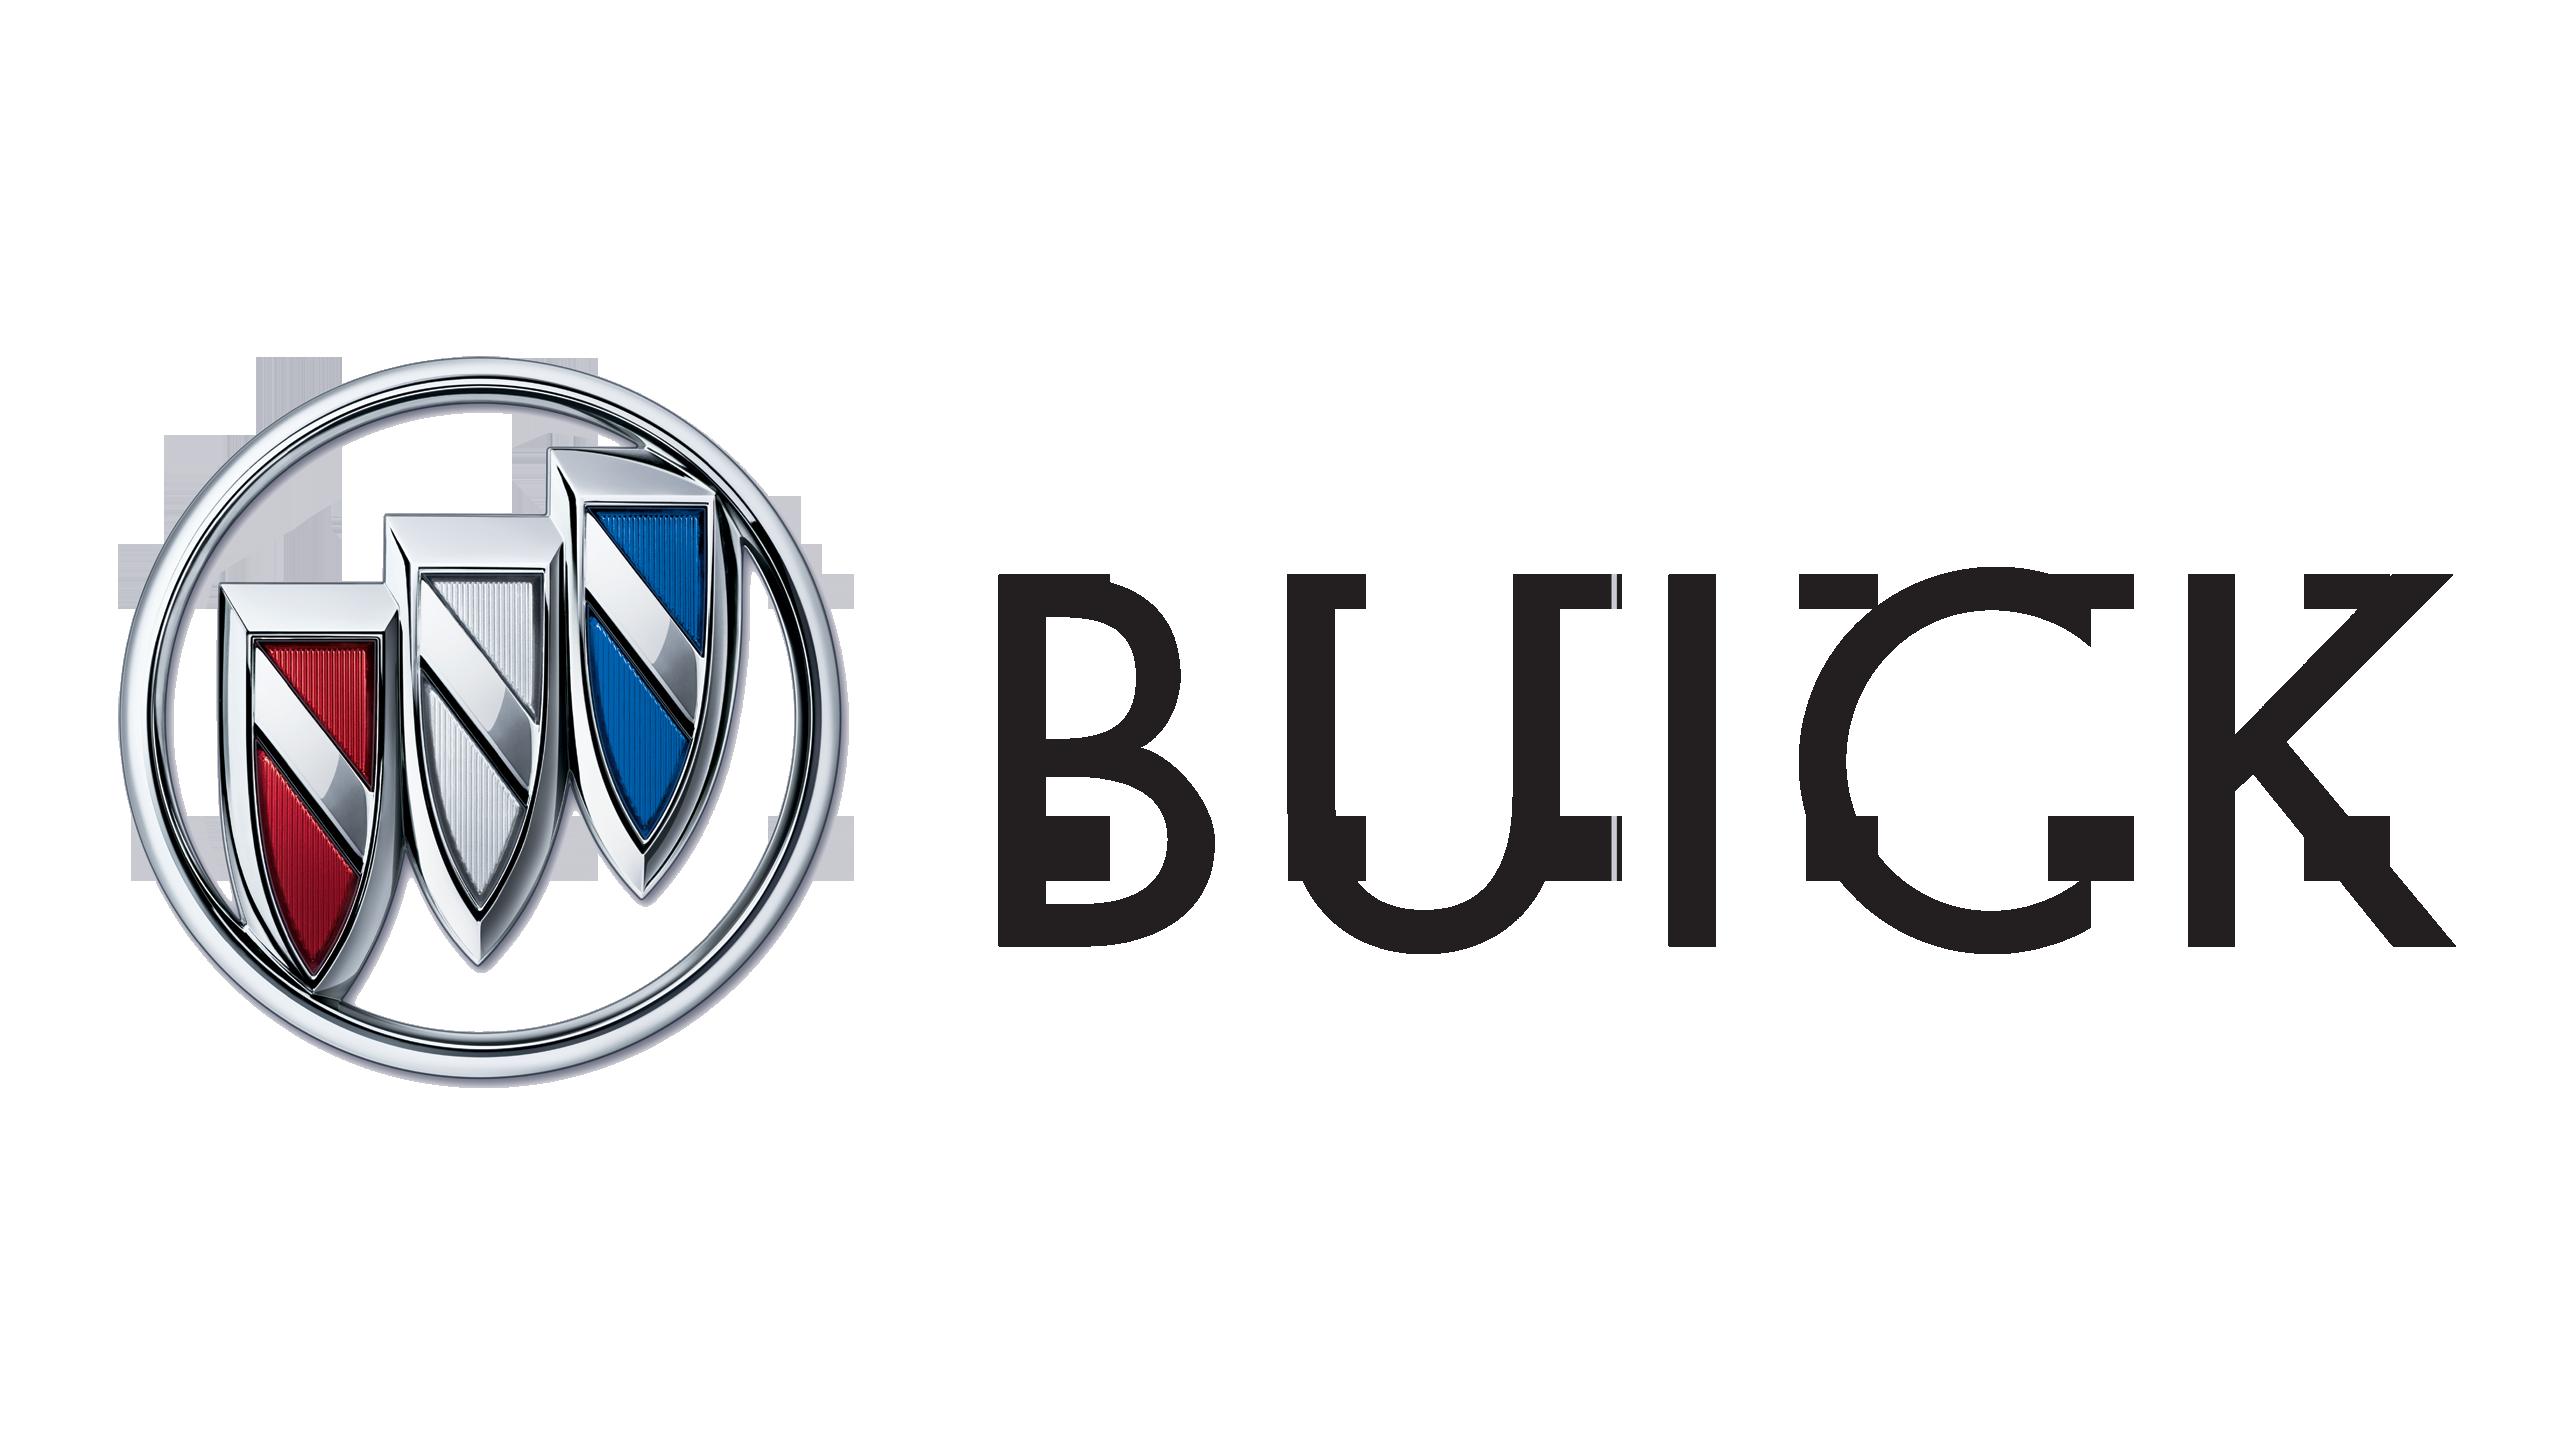 Buick-logo-2002-2560x1440